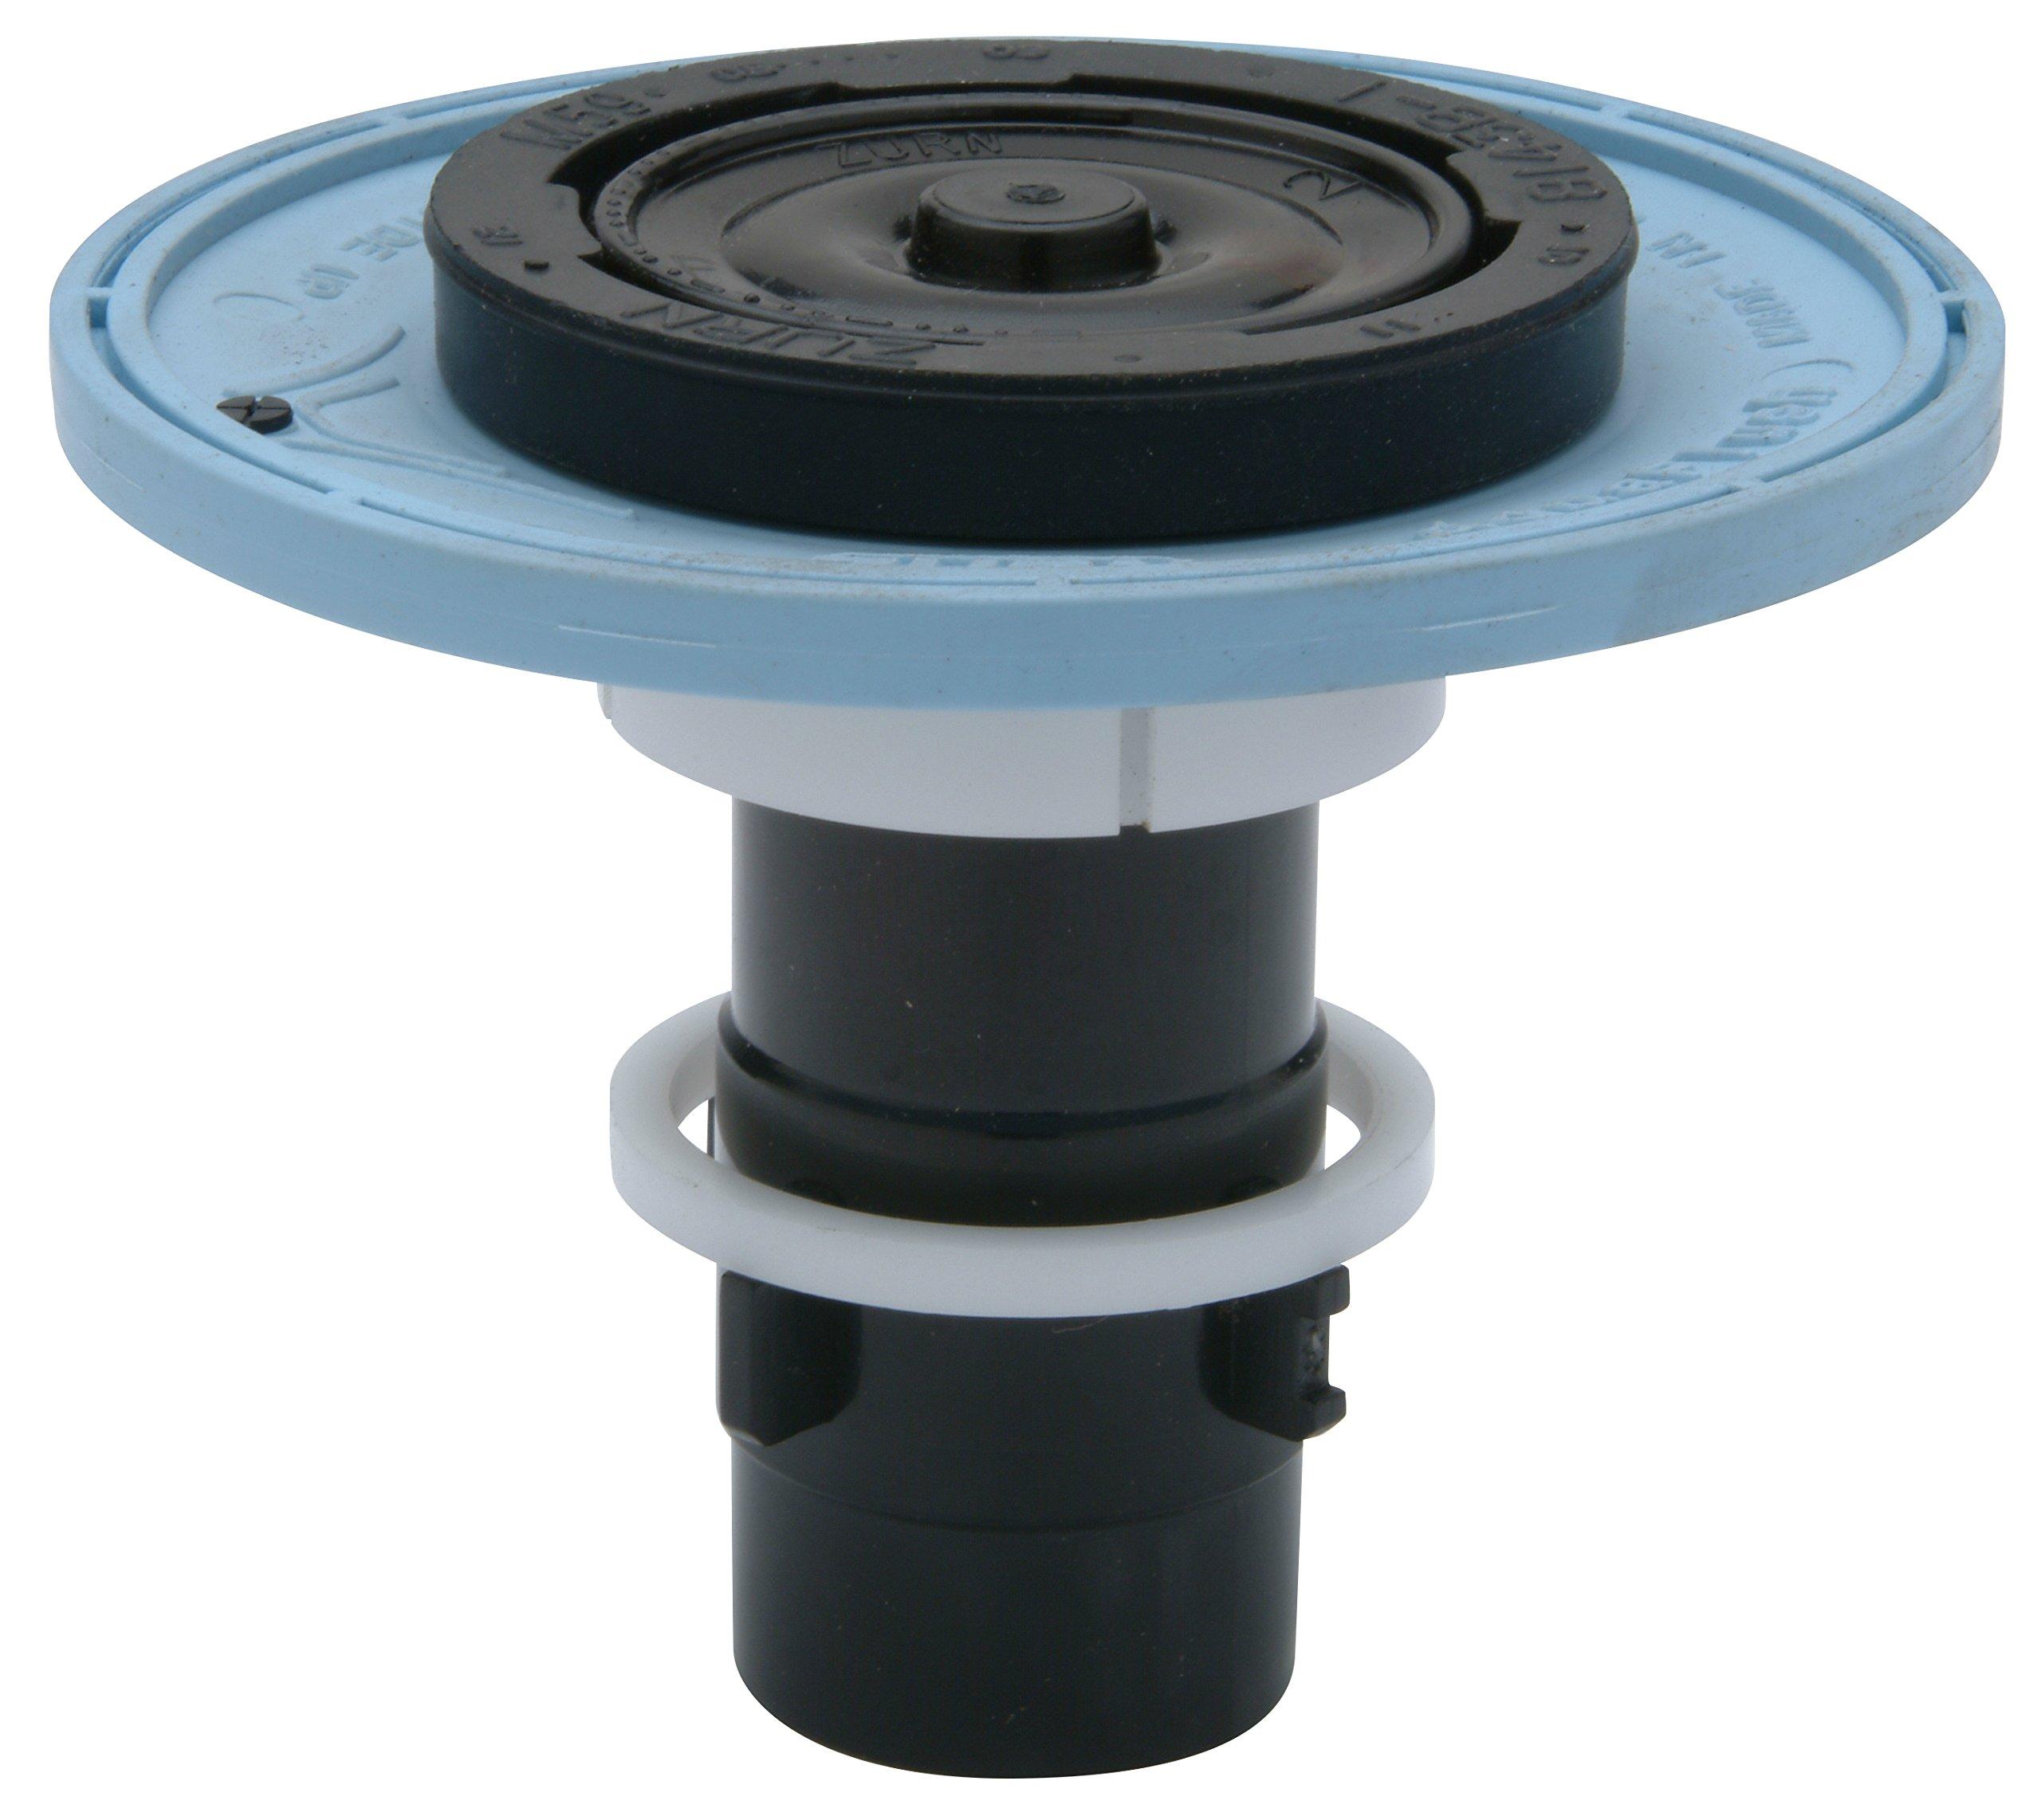 Zurn AquaVantage Urinal Repair Kit, P6000-EUA-ULF, 0.125 gpf, Diaphragm Repair Kit by Zurn